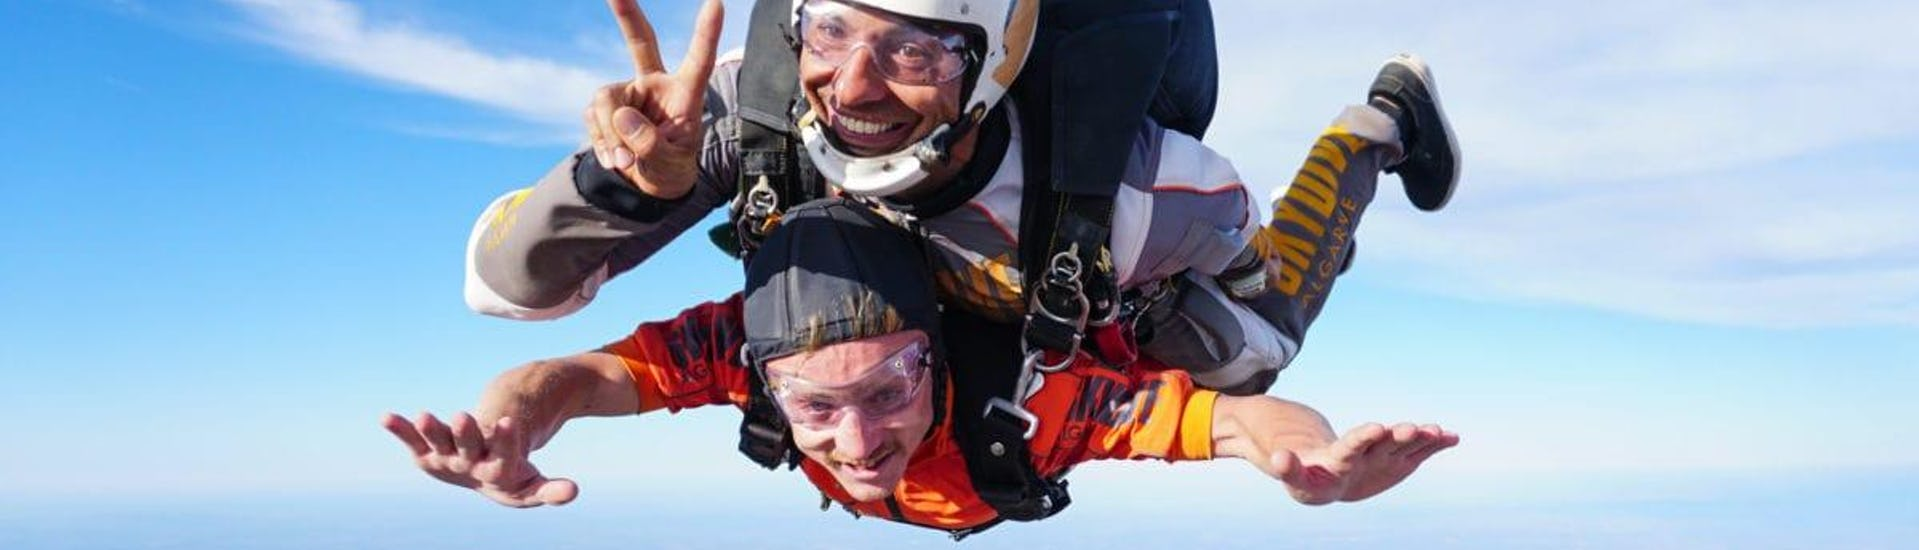 Tandem Skydive from 10,000 ft - Algarve